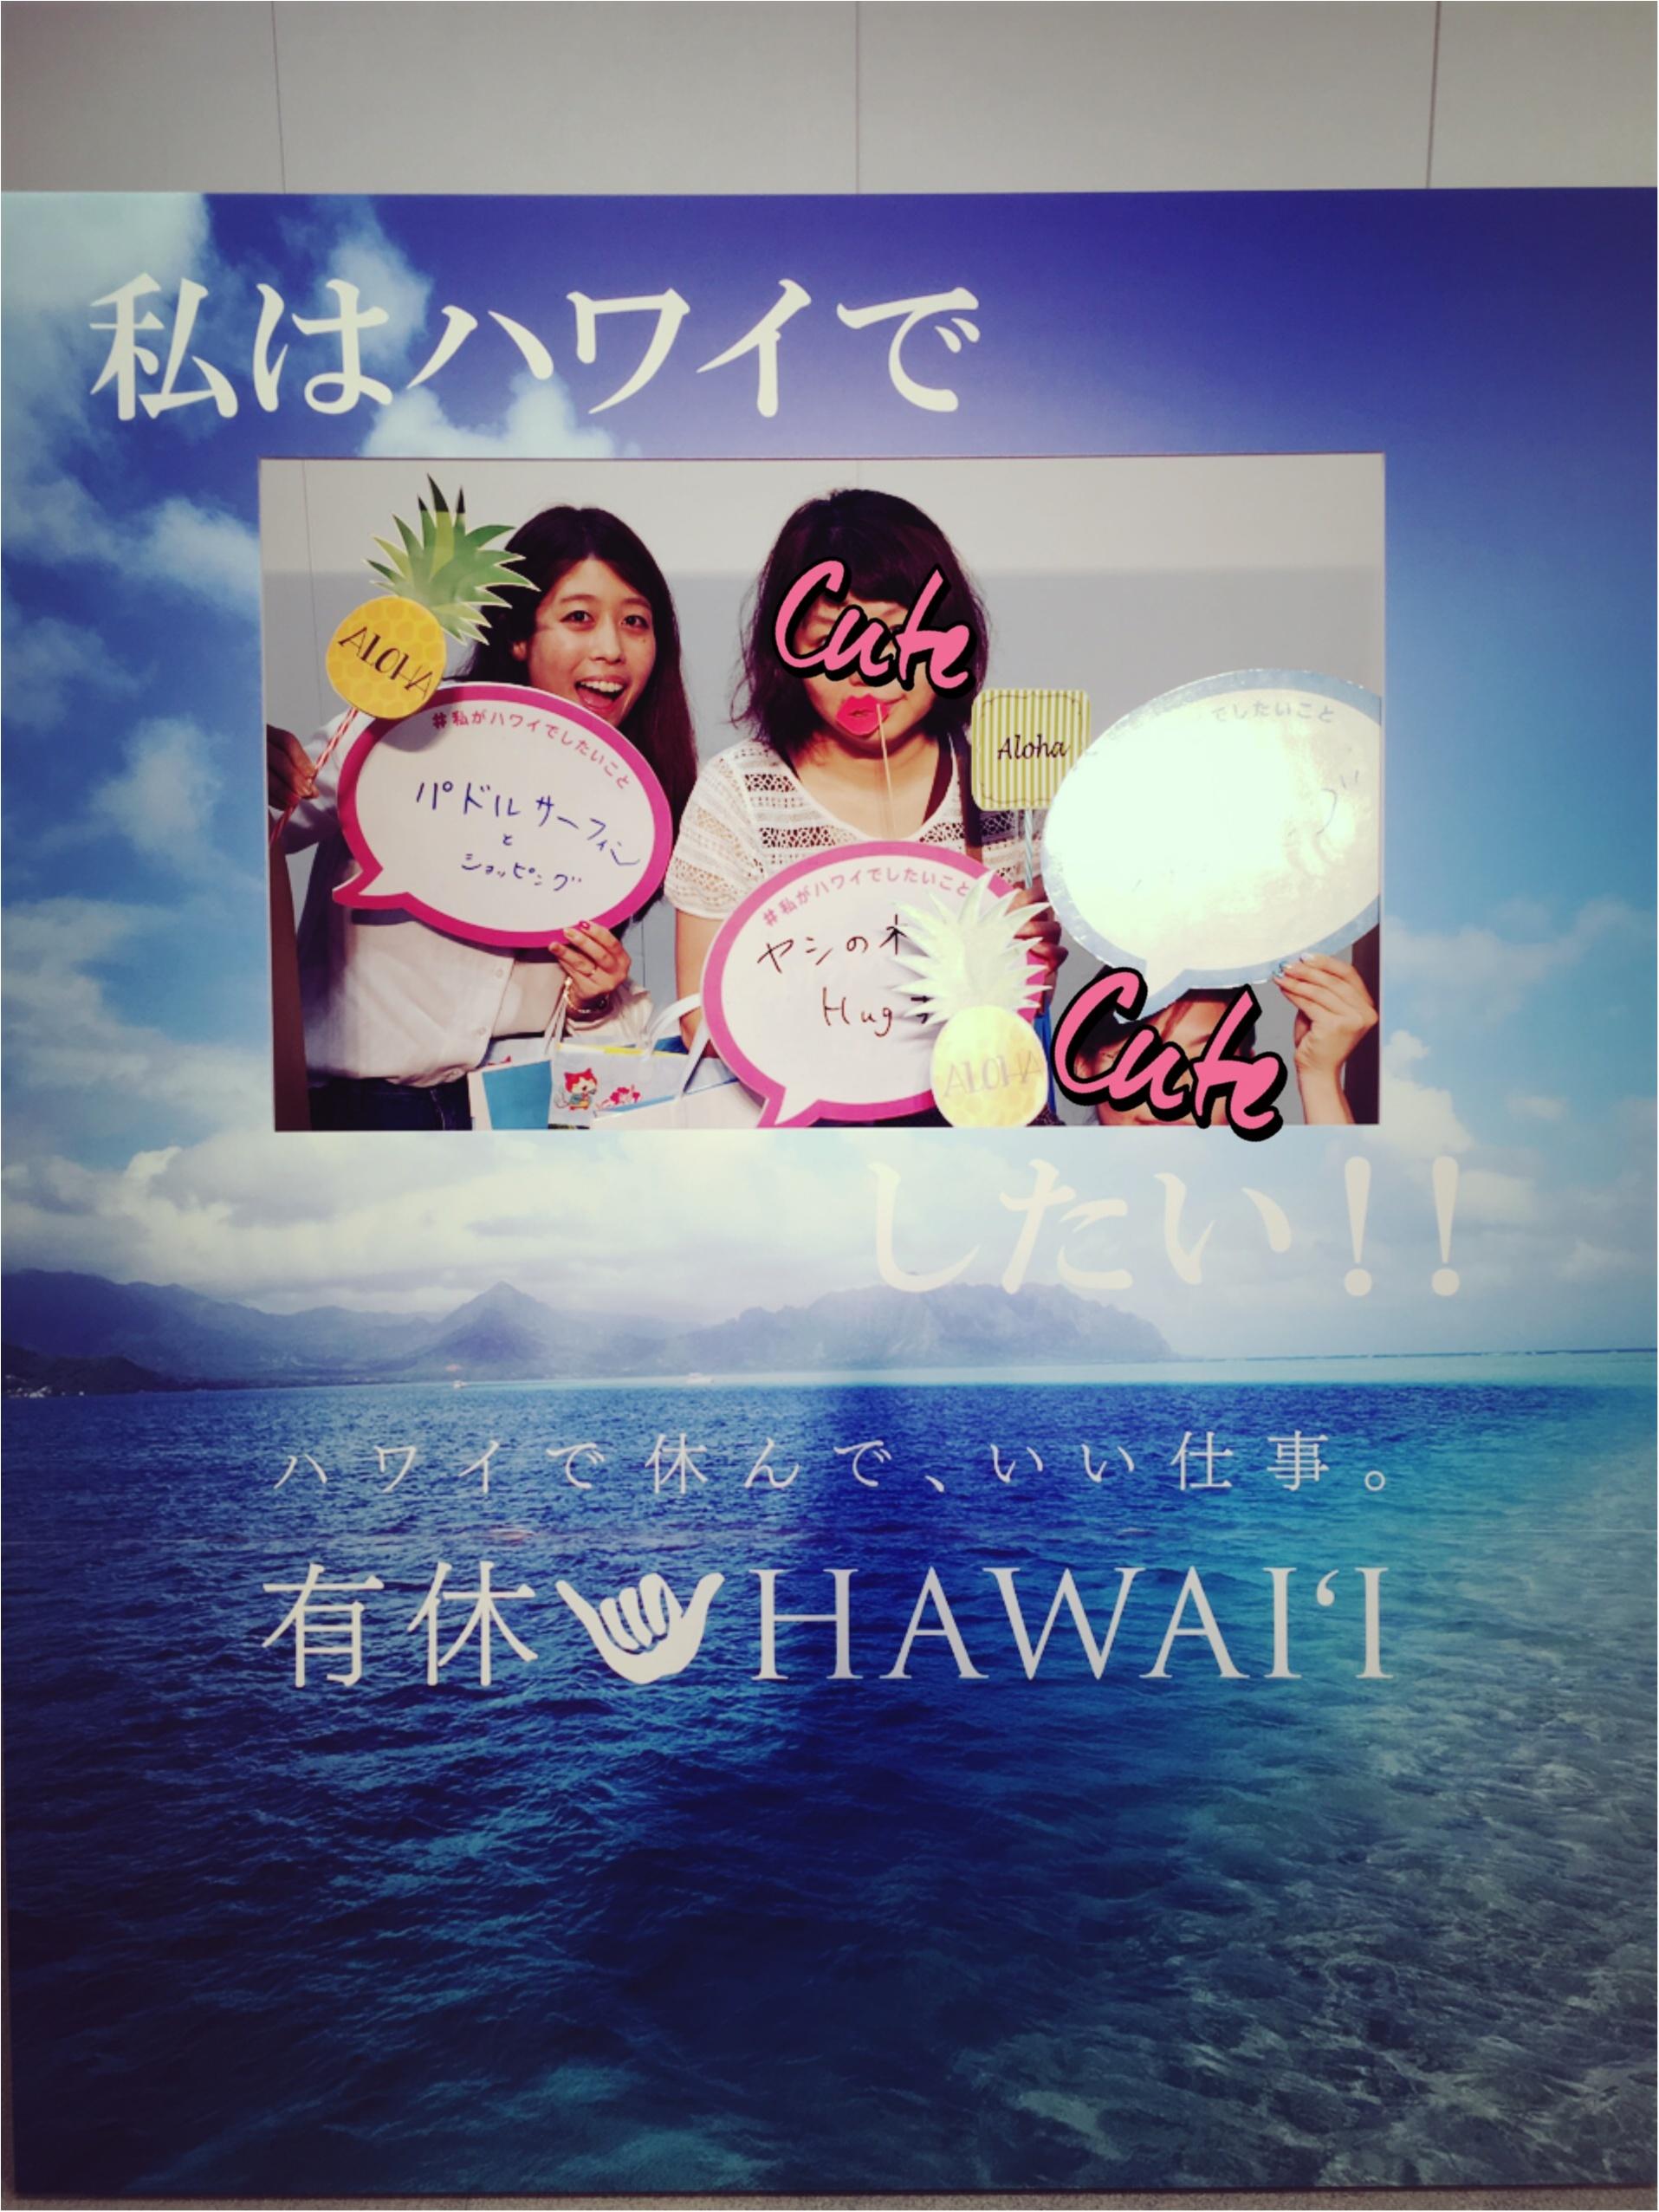 HAWAII EXPO 2016 渋谷ヒカリエで開催中♡byじゅな_7